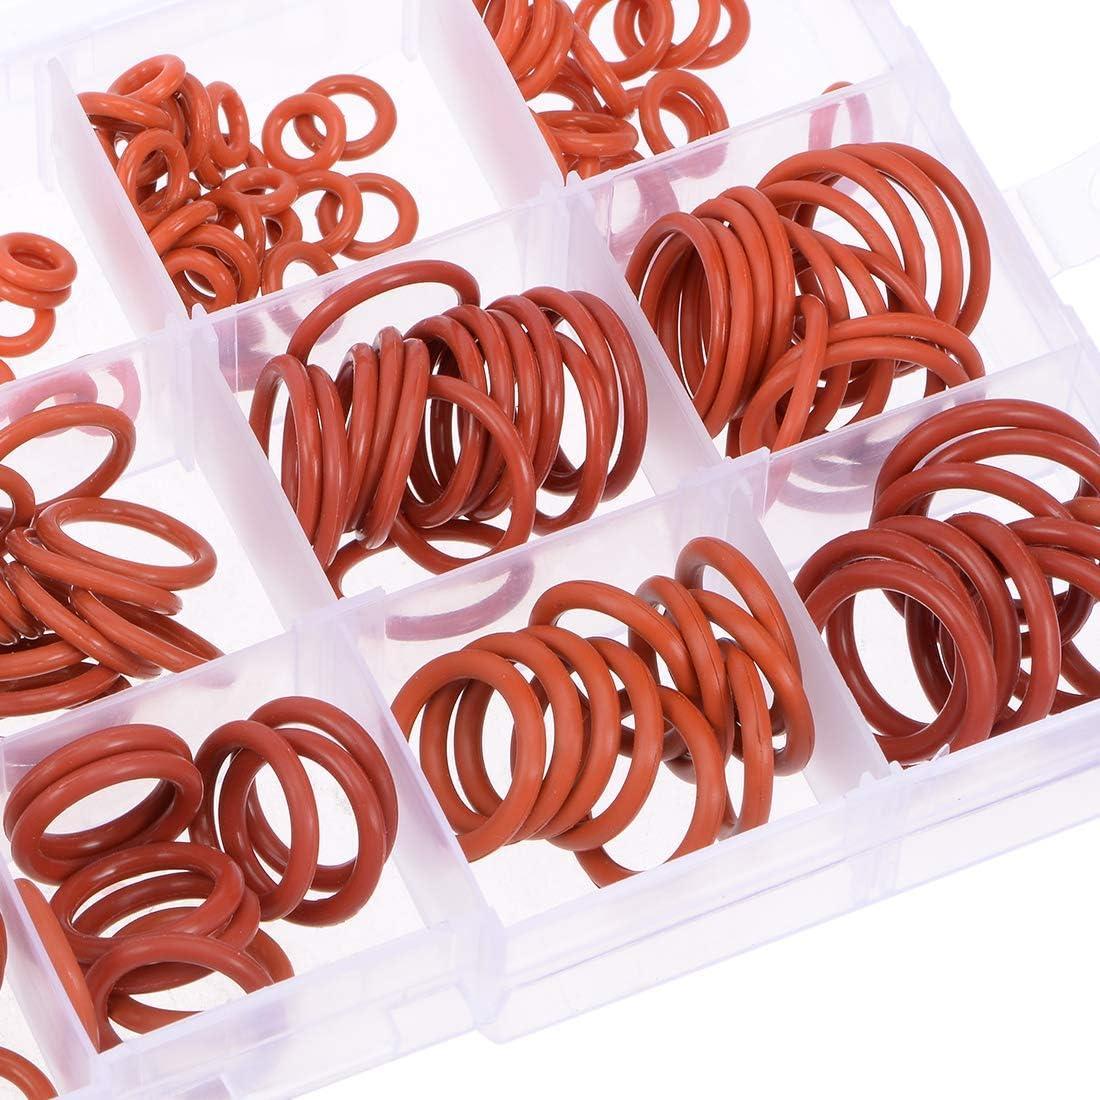 225pcs Metric Seal Rings Assortment Set Red Higomall Silicone O-Ring Kit